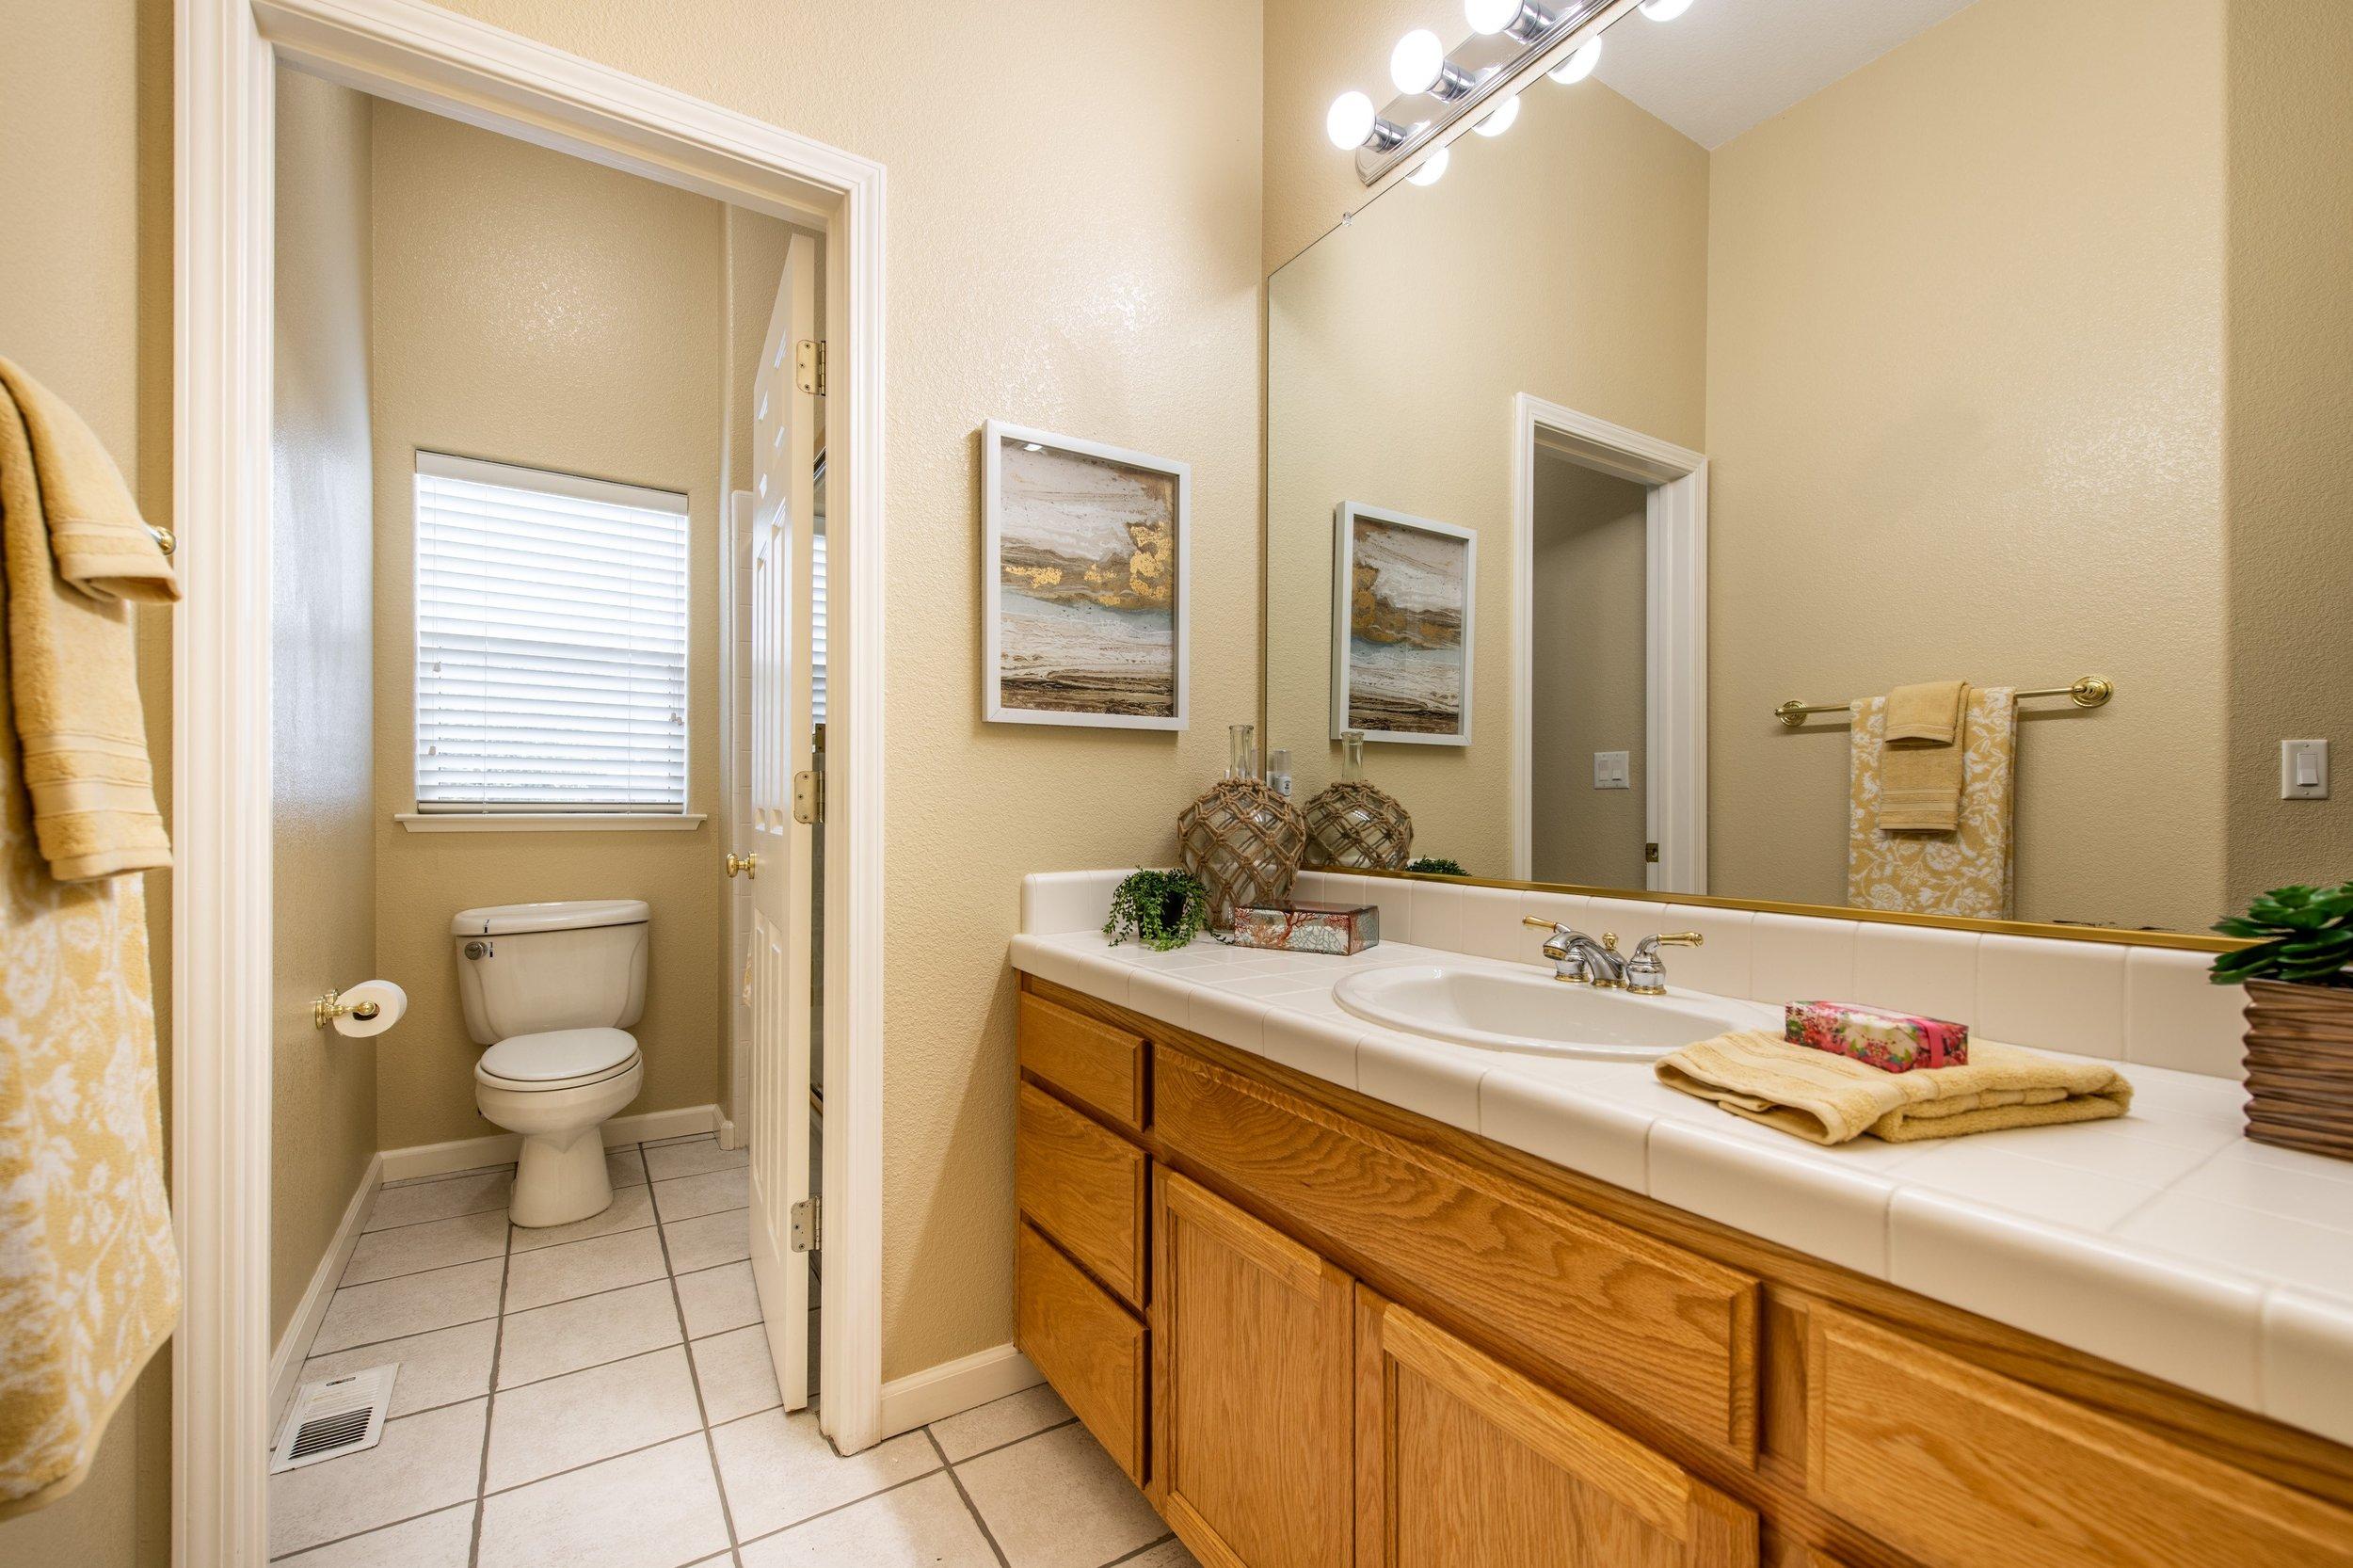 021_Ground Floor Bathroom .jpg